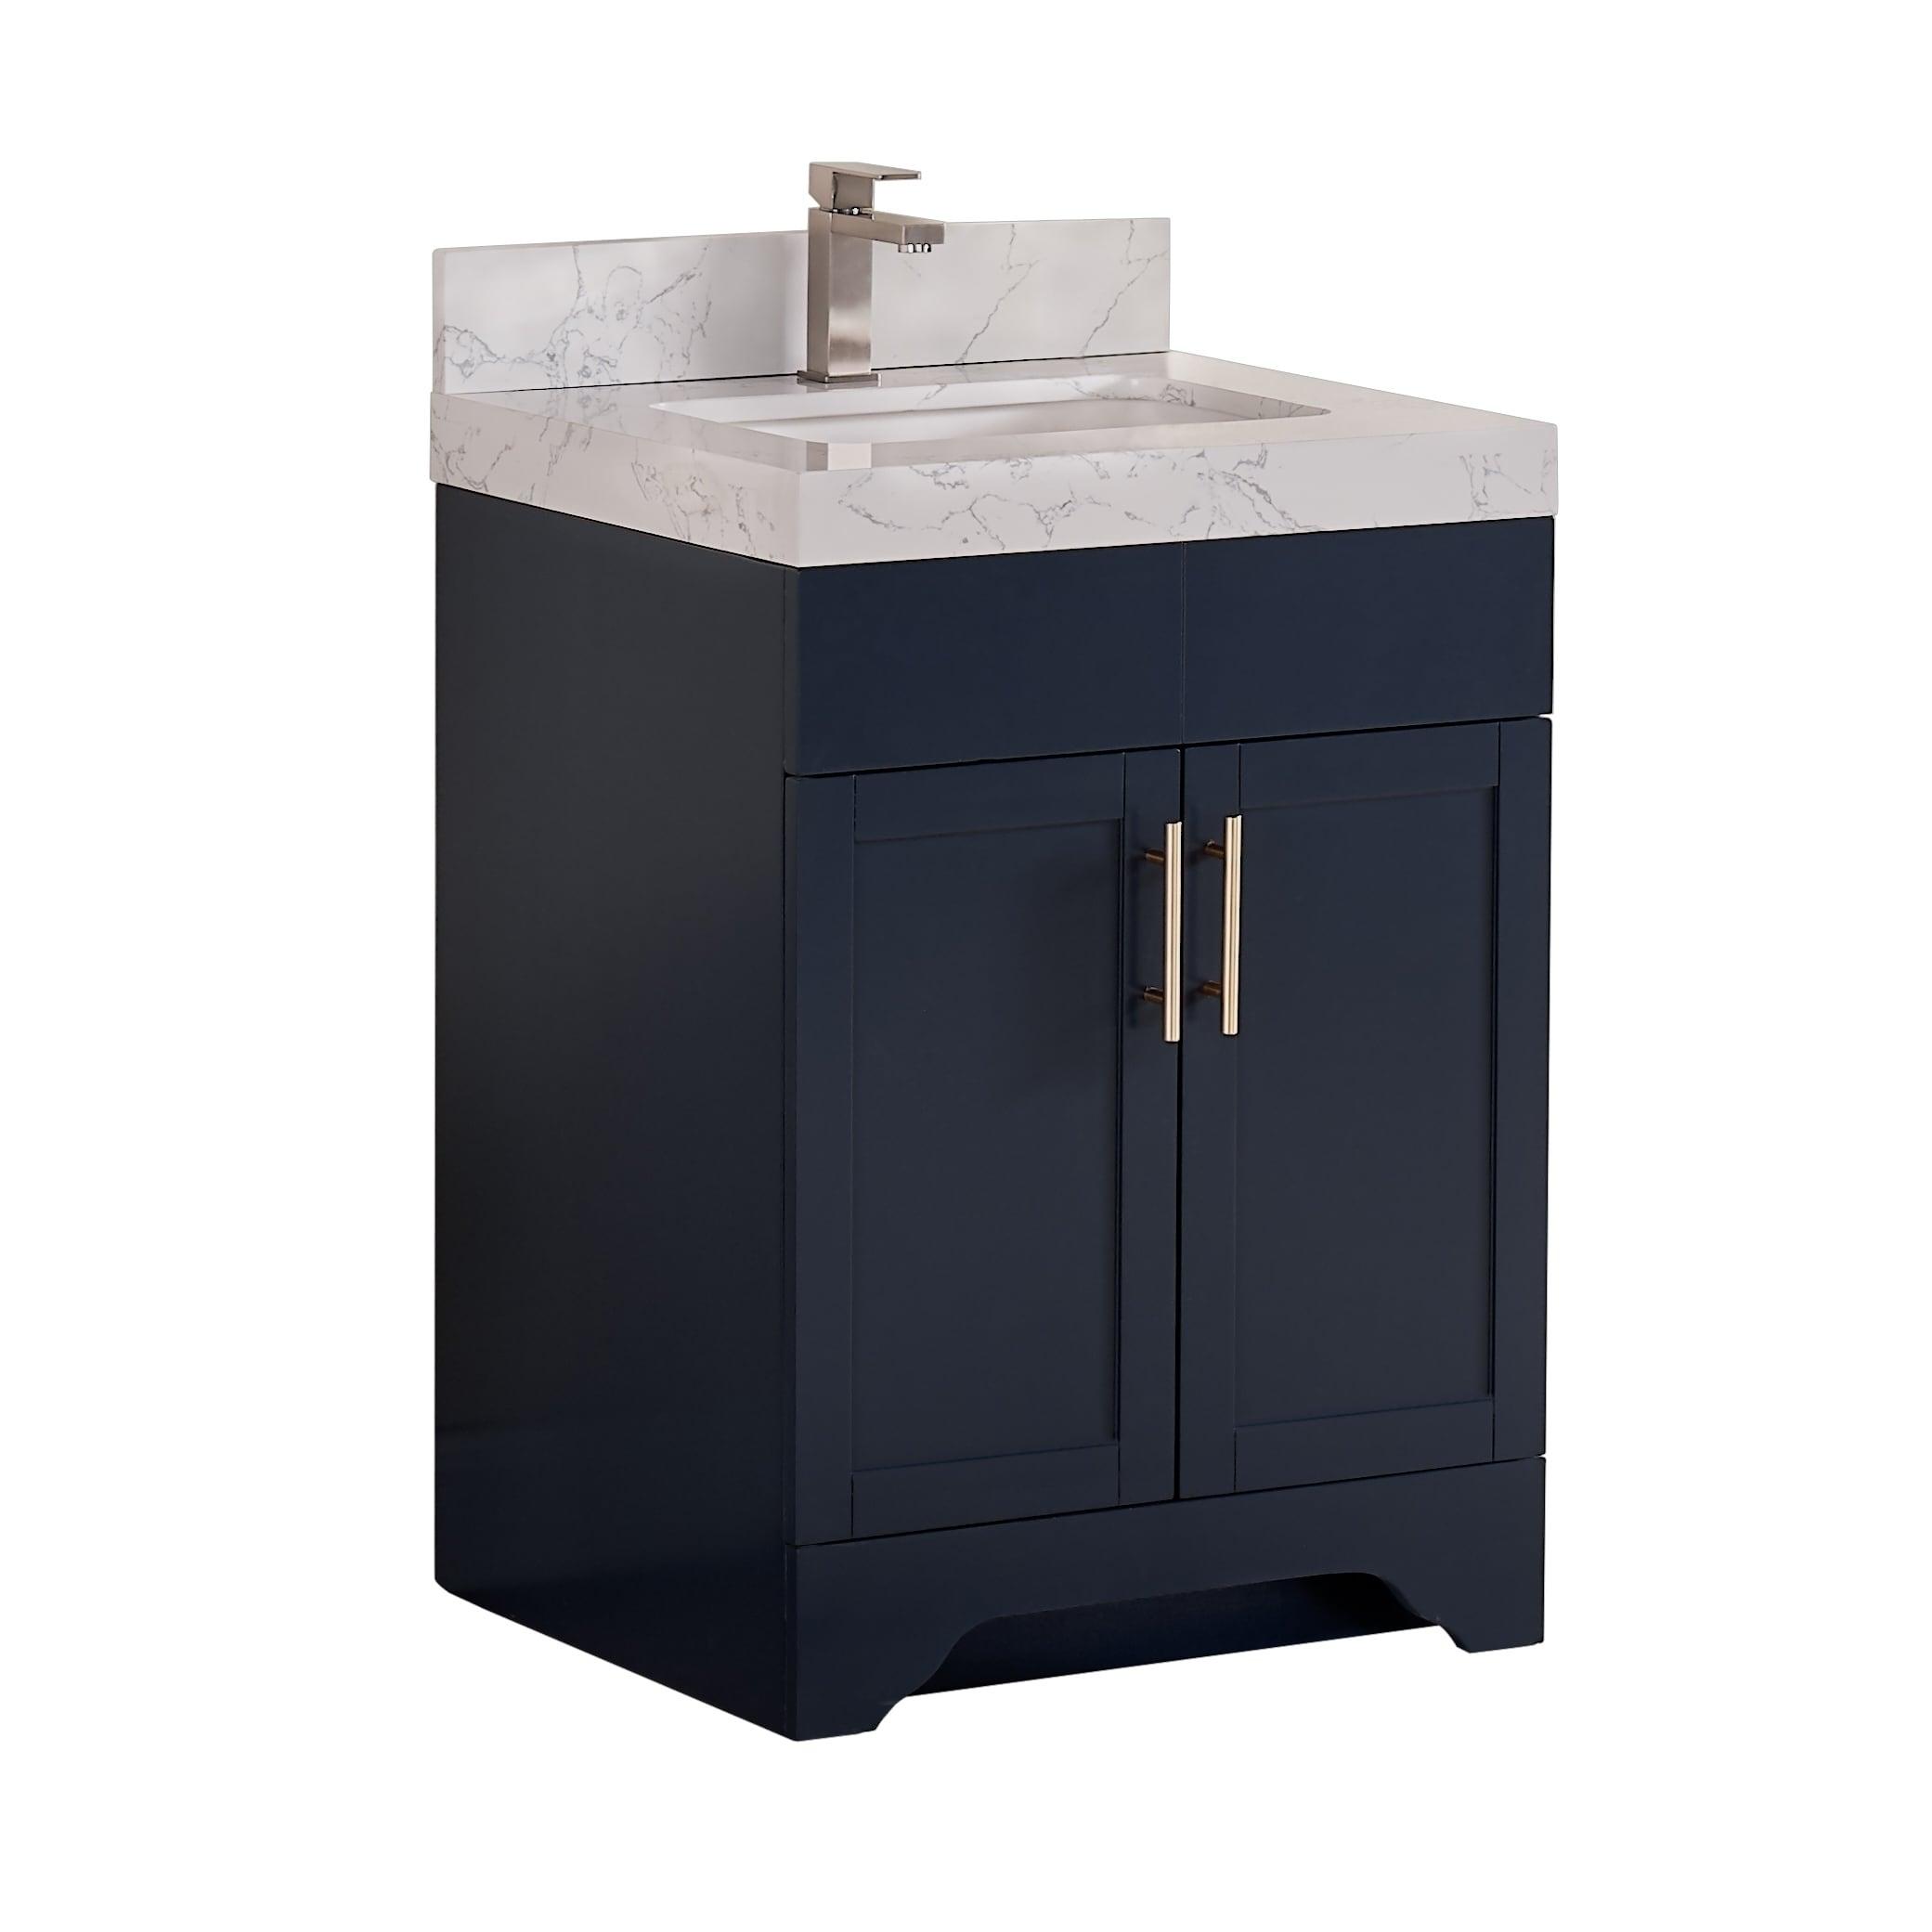 Shop Copper Grove Dian 24 Inch Single Sink Bathroom Vanity Set